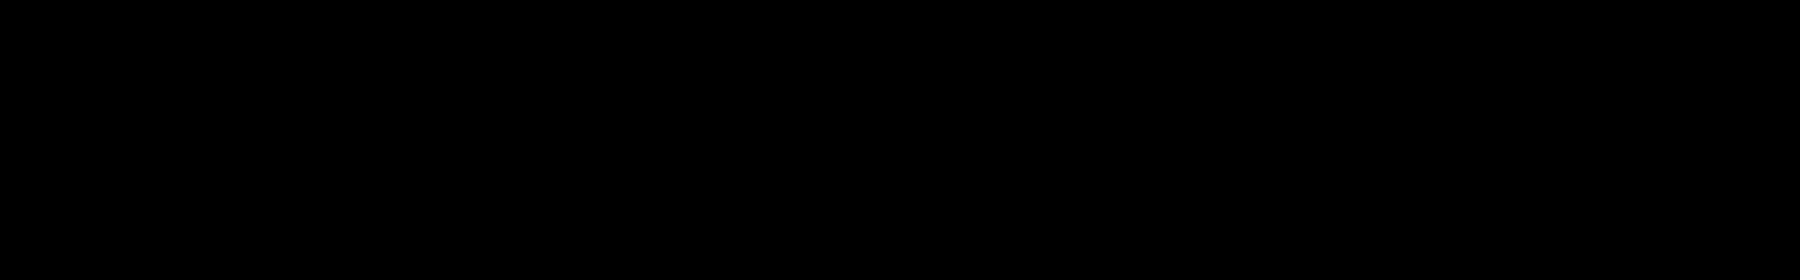 Poseidon audio waveform